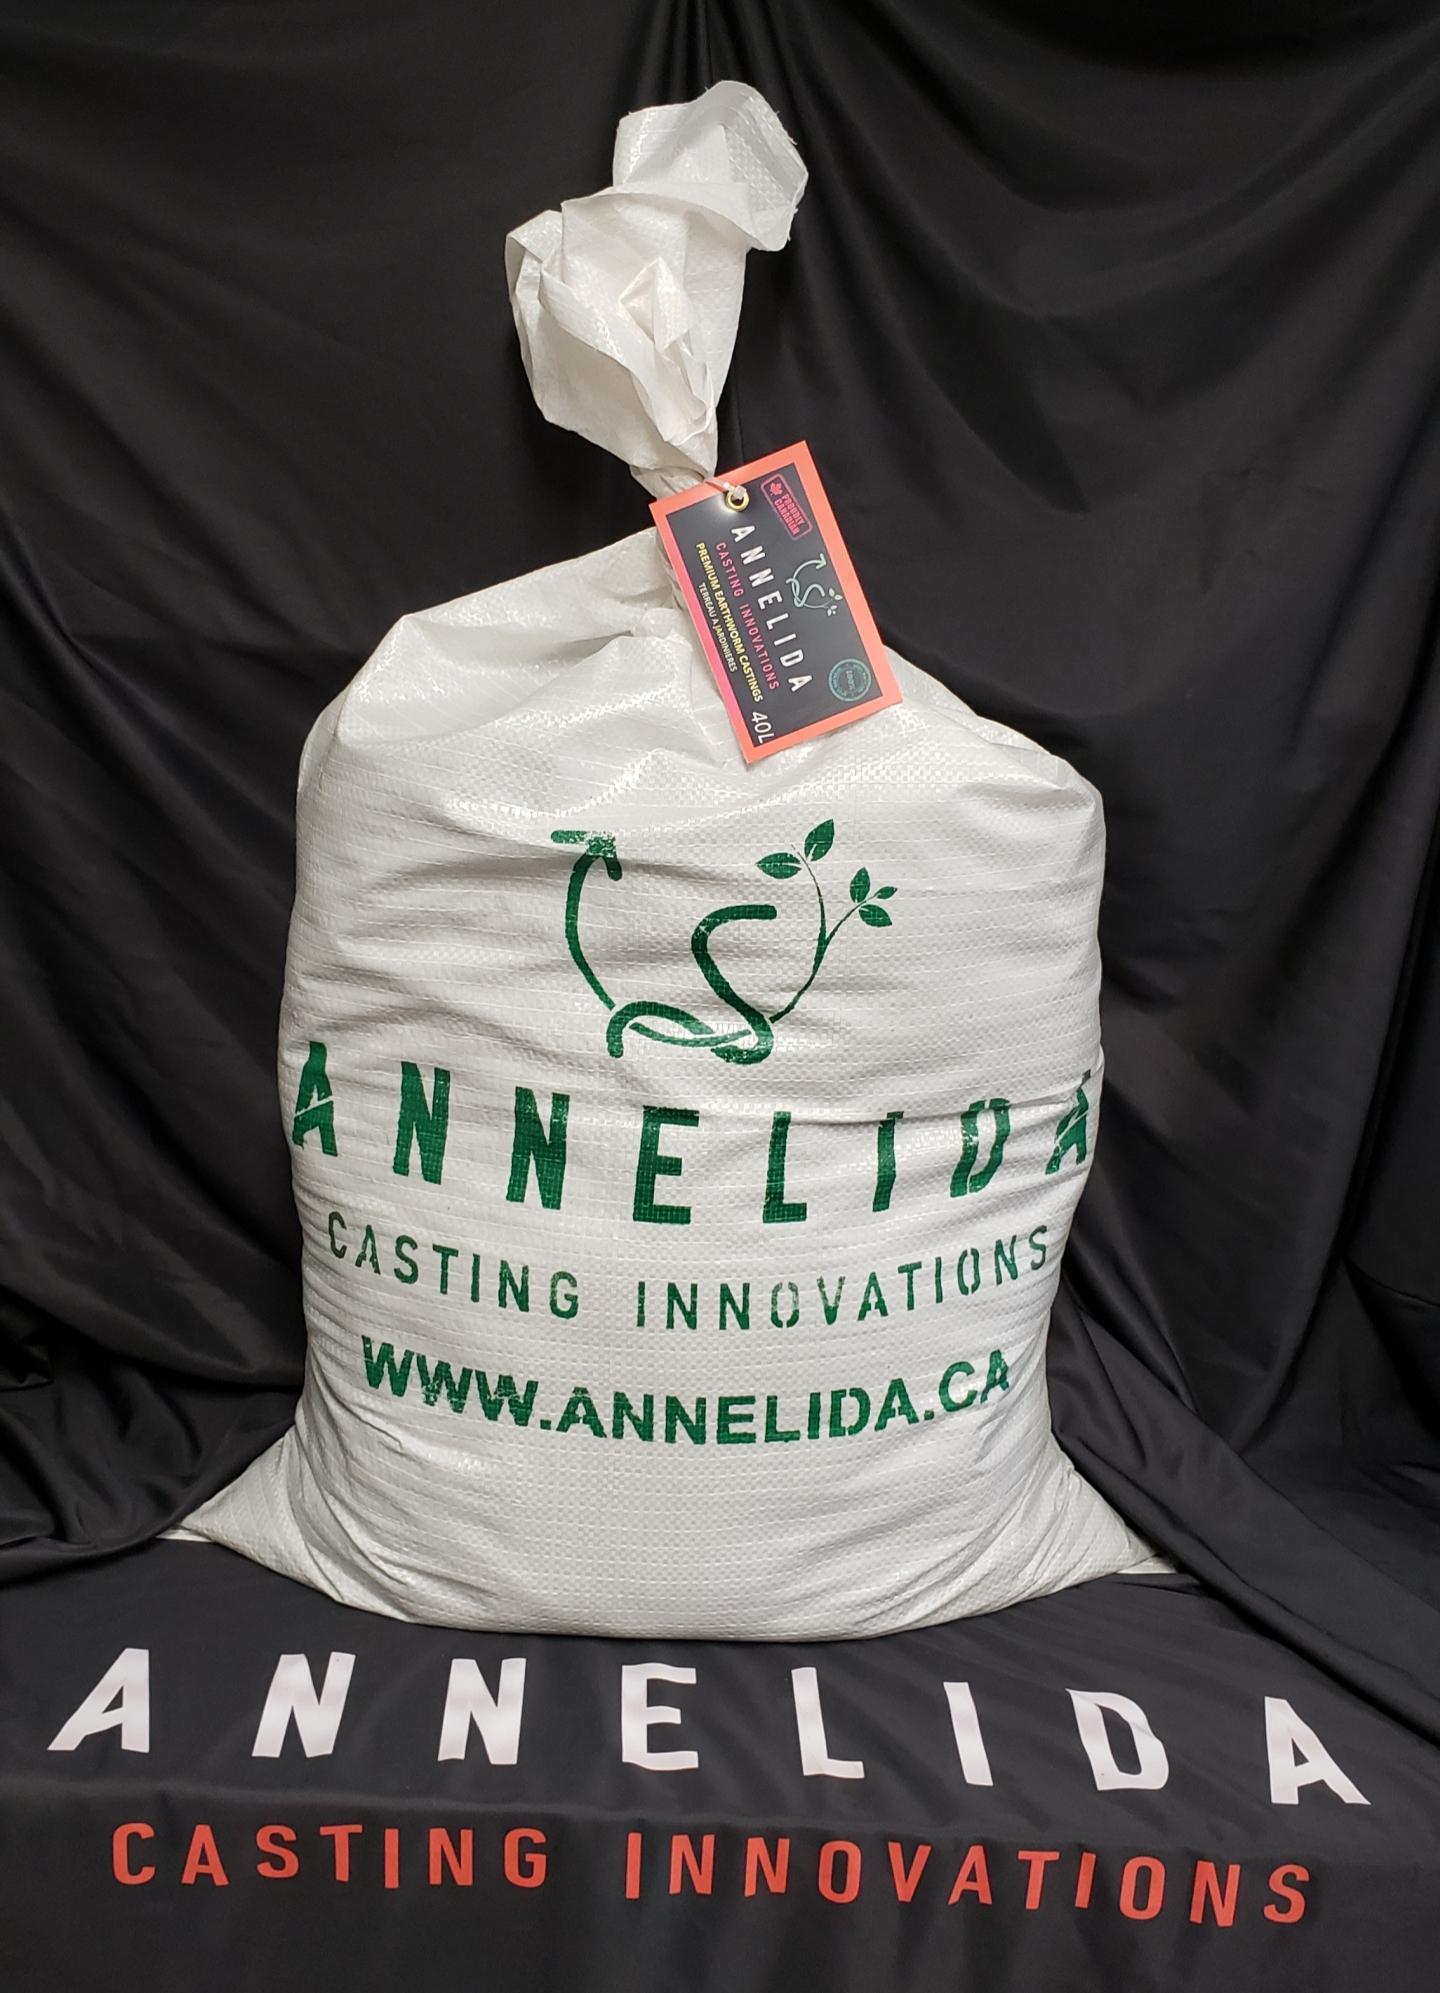 ANNELIDA - Premium Earthworm Castings - 40 Litre